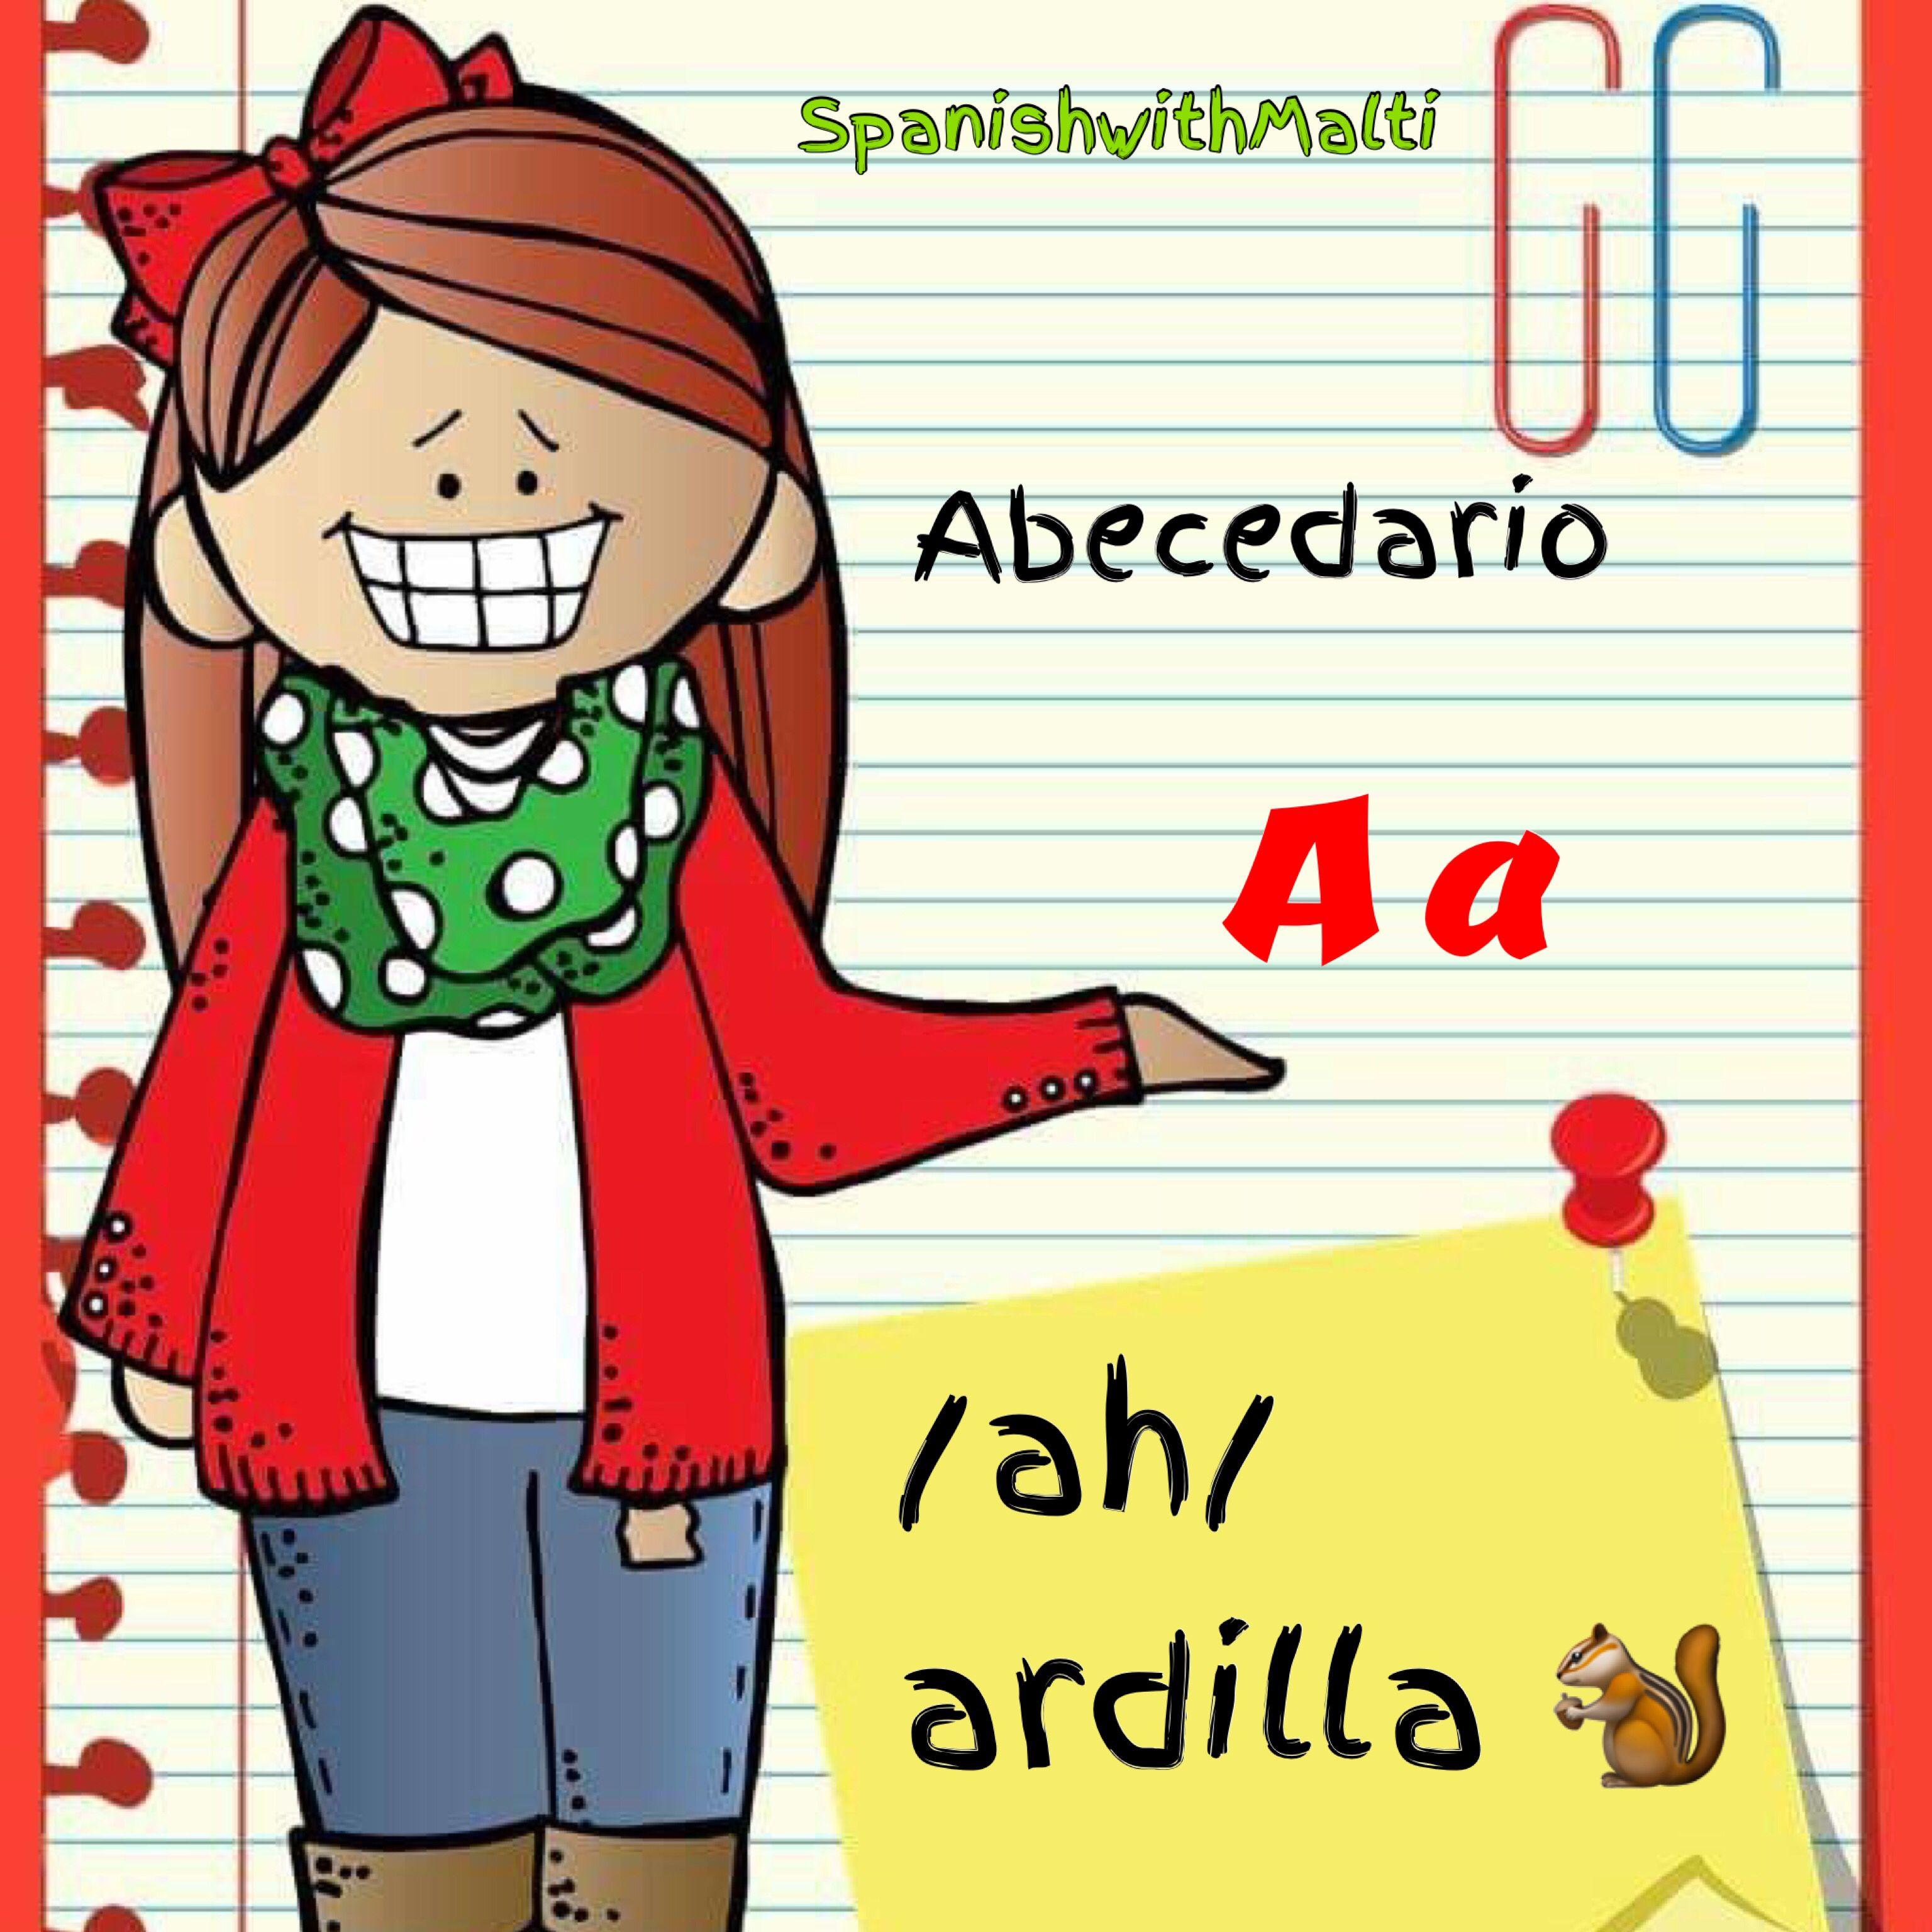 A /ay/ ardilla Spanish language learning, Spanish